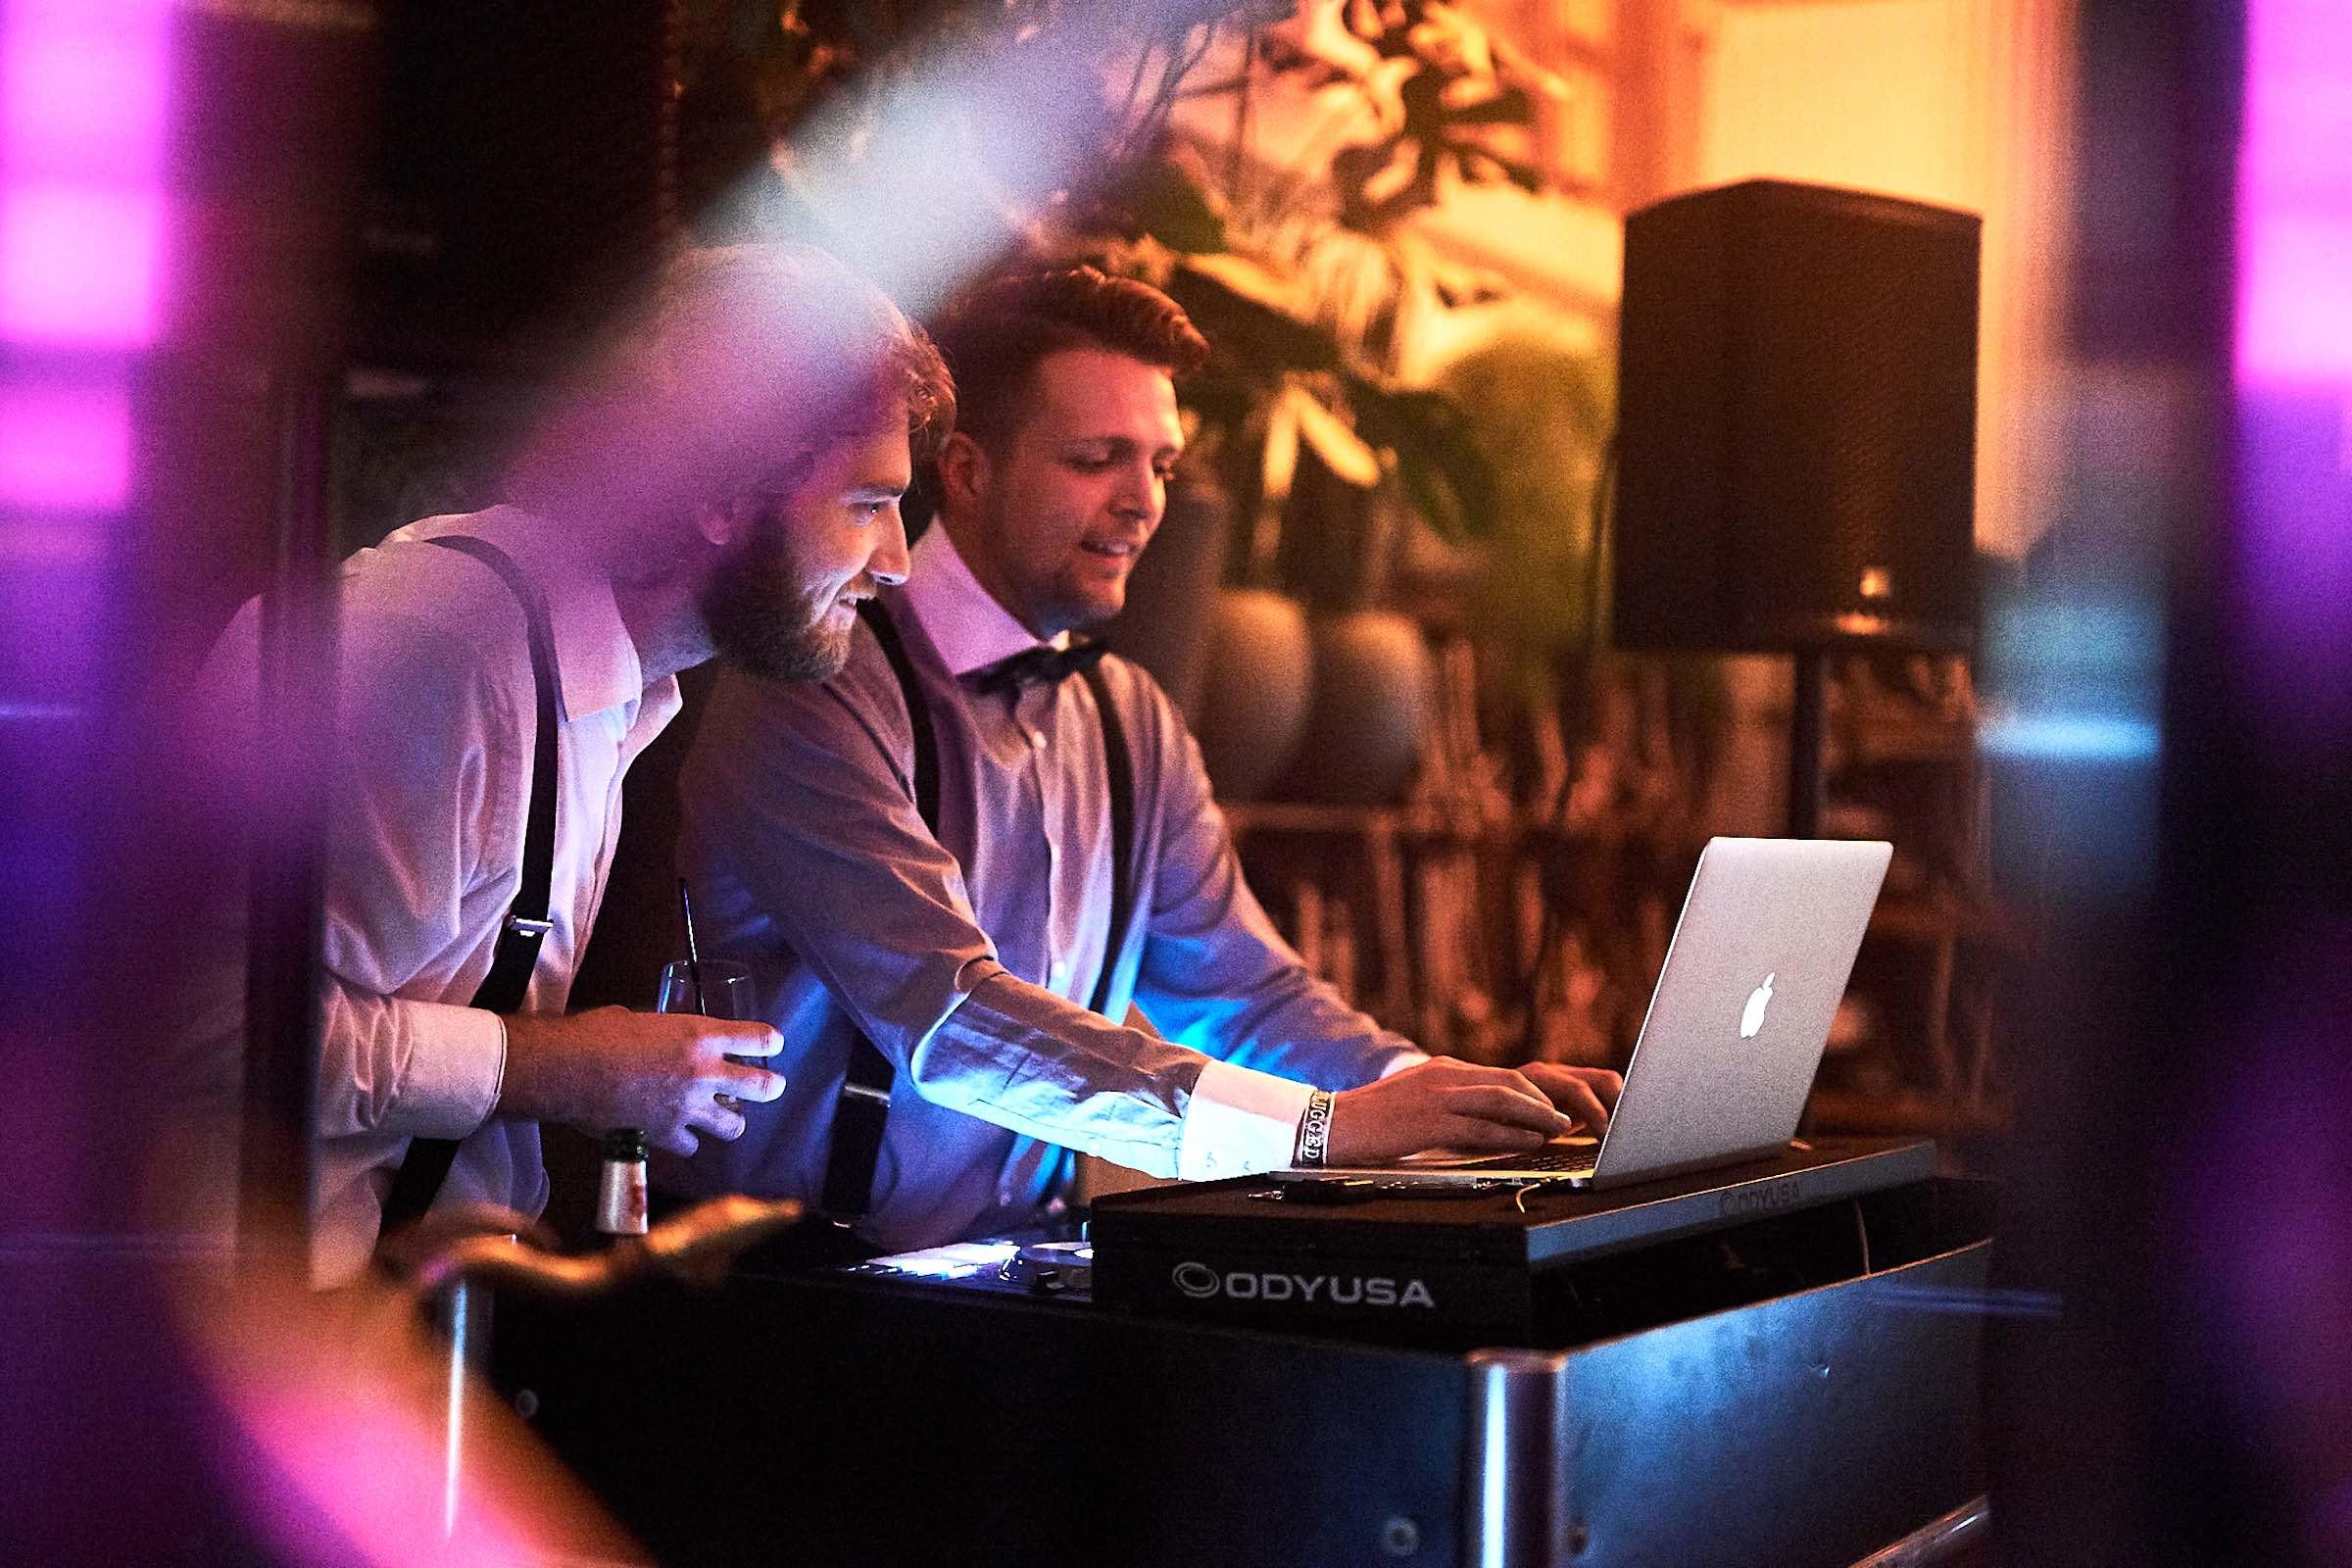 DJ | Hannover | Hochzeit | Timm | Lehmann | DJ | Firmenfeier | Event | DJ | Geburtstag | Buchen | Discjockey | Mieten | Anfragen | Musikwünsche | Lehmann | Eventservice